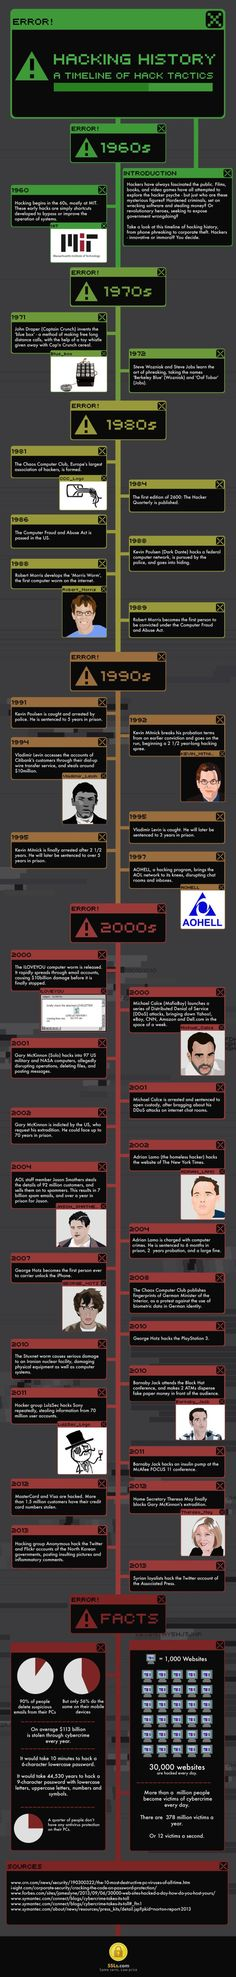 [infografia] La historia del Hacking #infographic